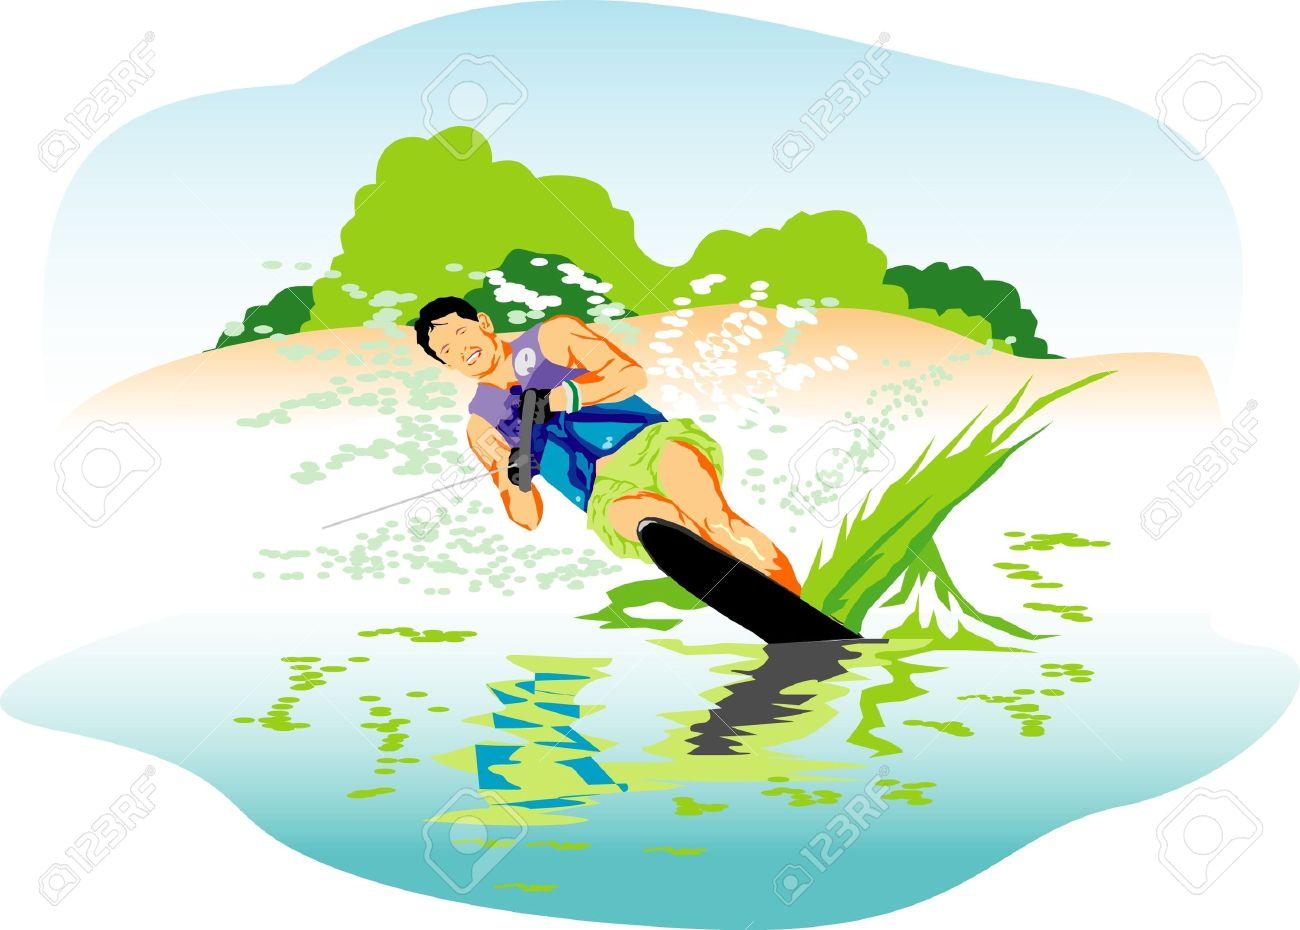 Water Skiing Vector Illustration Royalty Free Cliparts, Vectors.